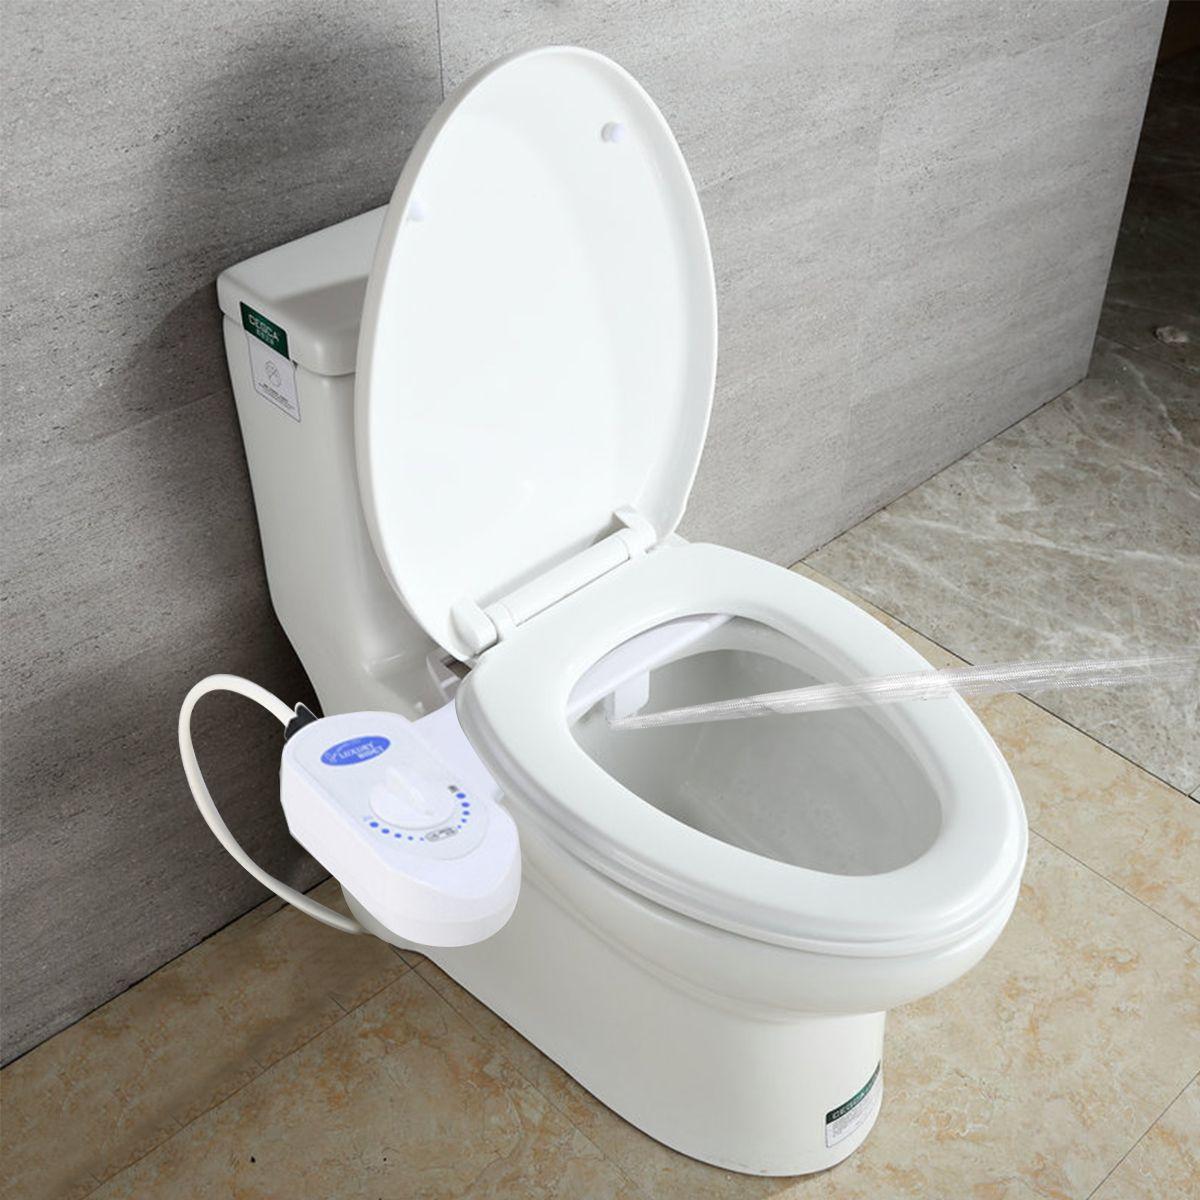 Non Electric Bidet Toilet Bidet Seat Self Cleaning Nozzle Fresh In